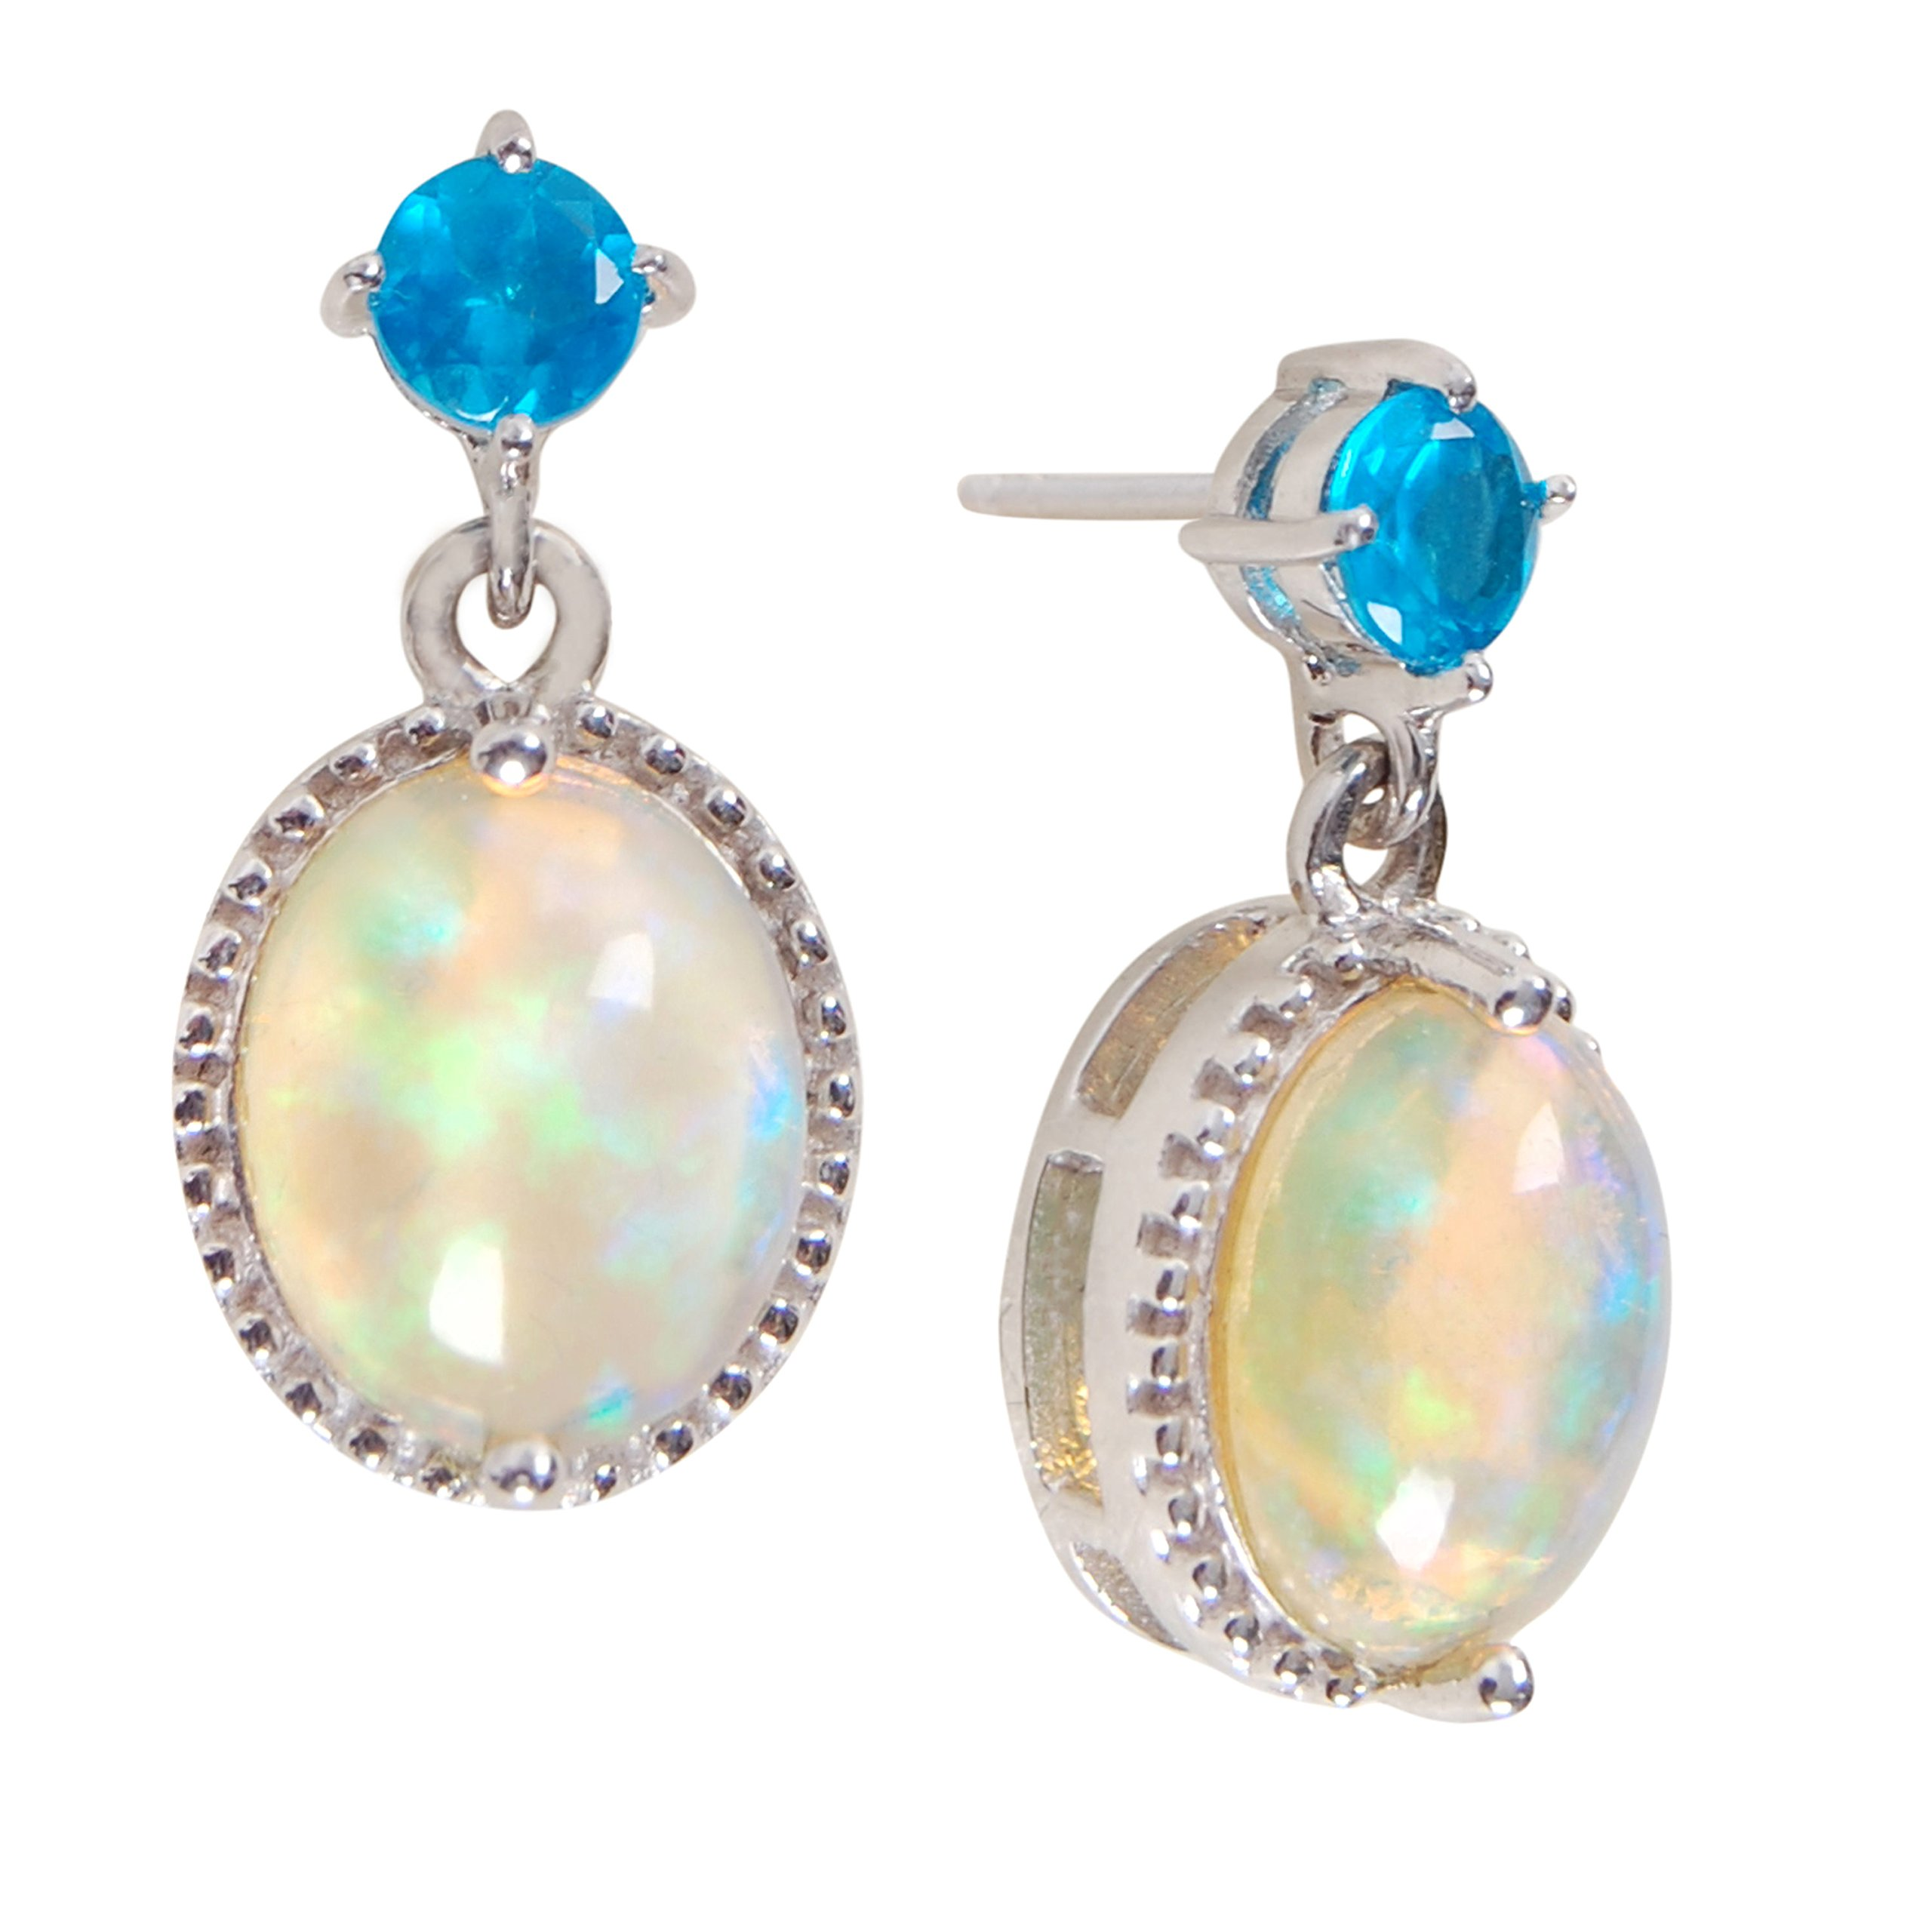 Humble Chic Natural Opal Drop Stud Earrings - Genuine Birthstone Gemstones in 925 Sterling Silver, Opal, Rainbow White, Neon Blue, Hypoallergenic